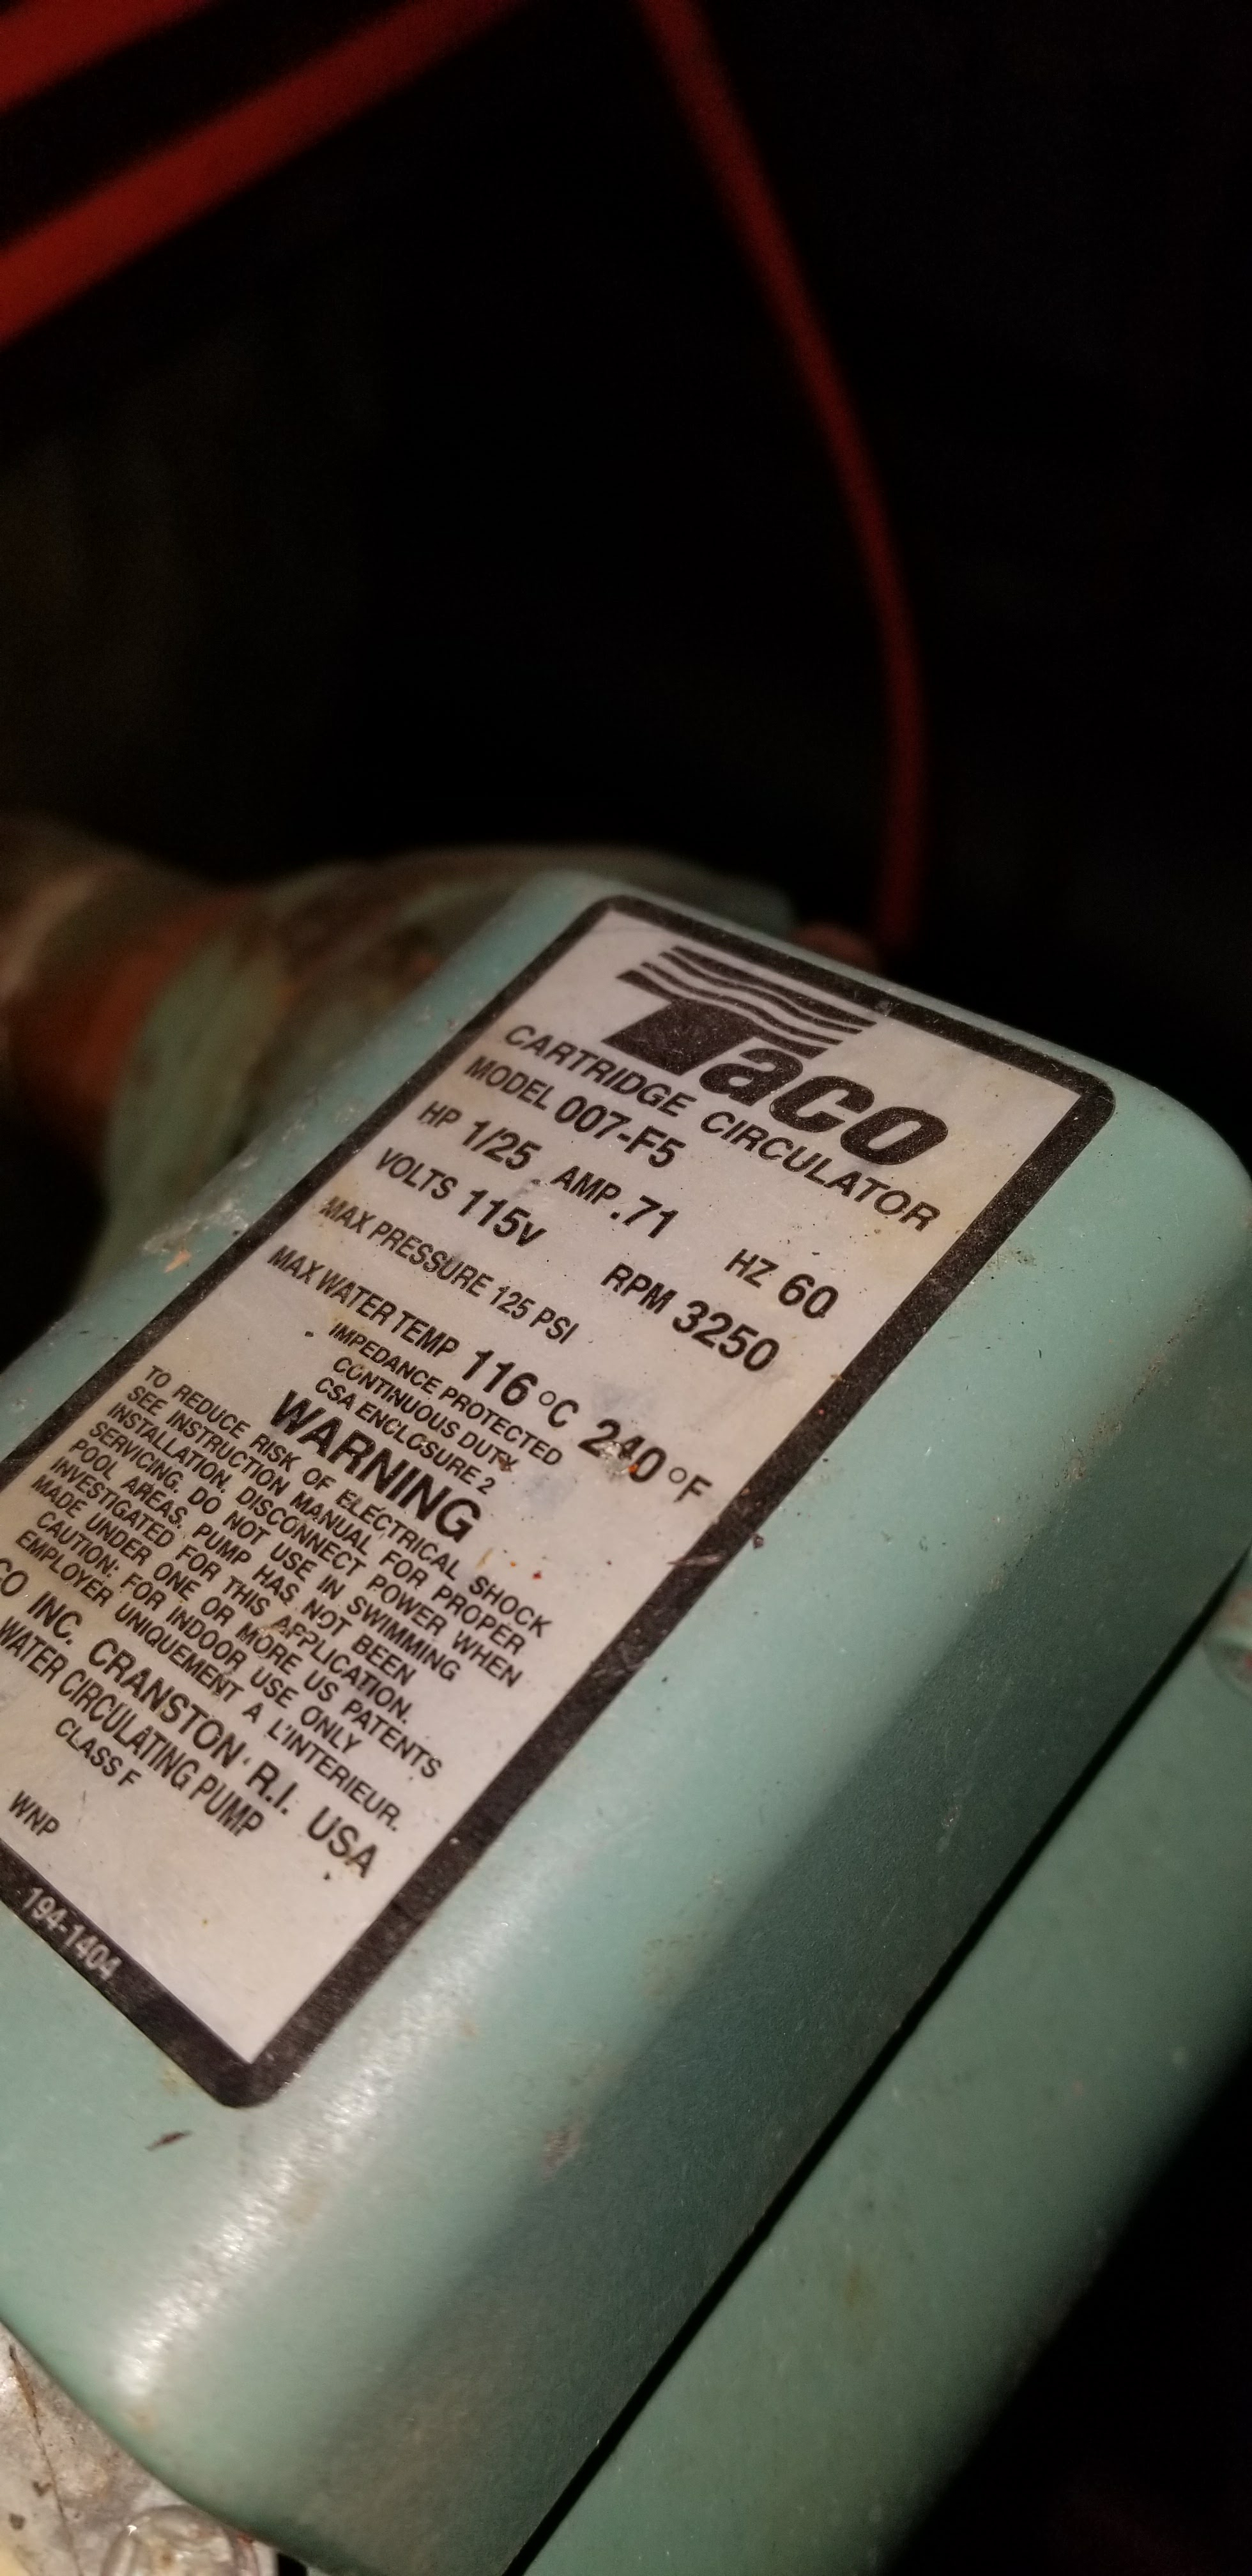 Gas burner: riello 40 gas burner manual.